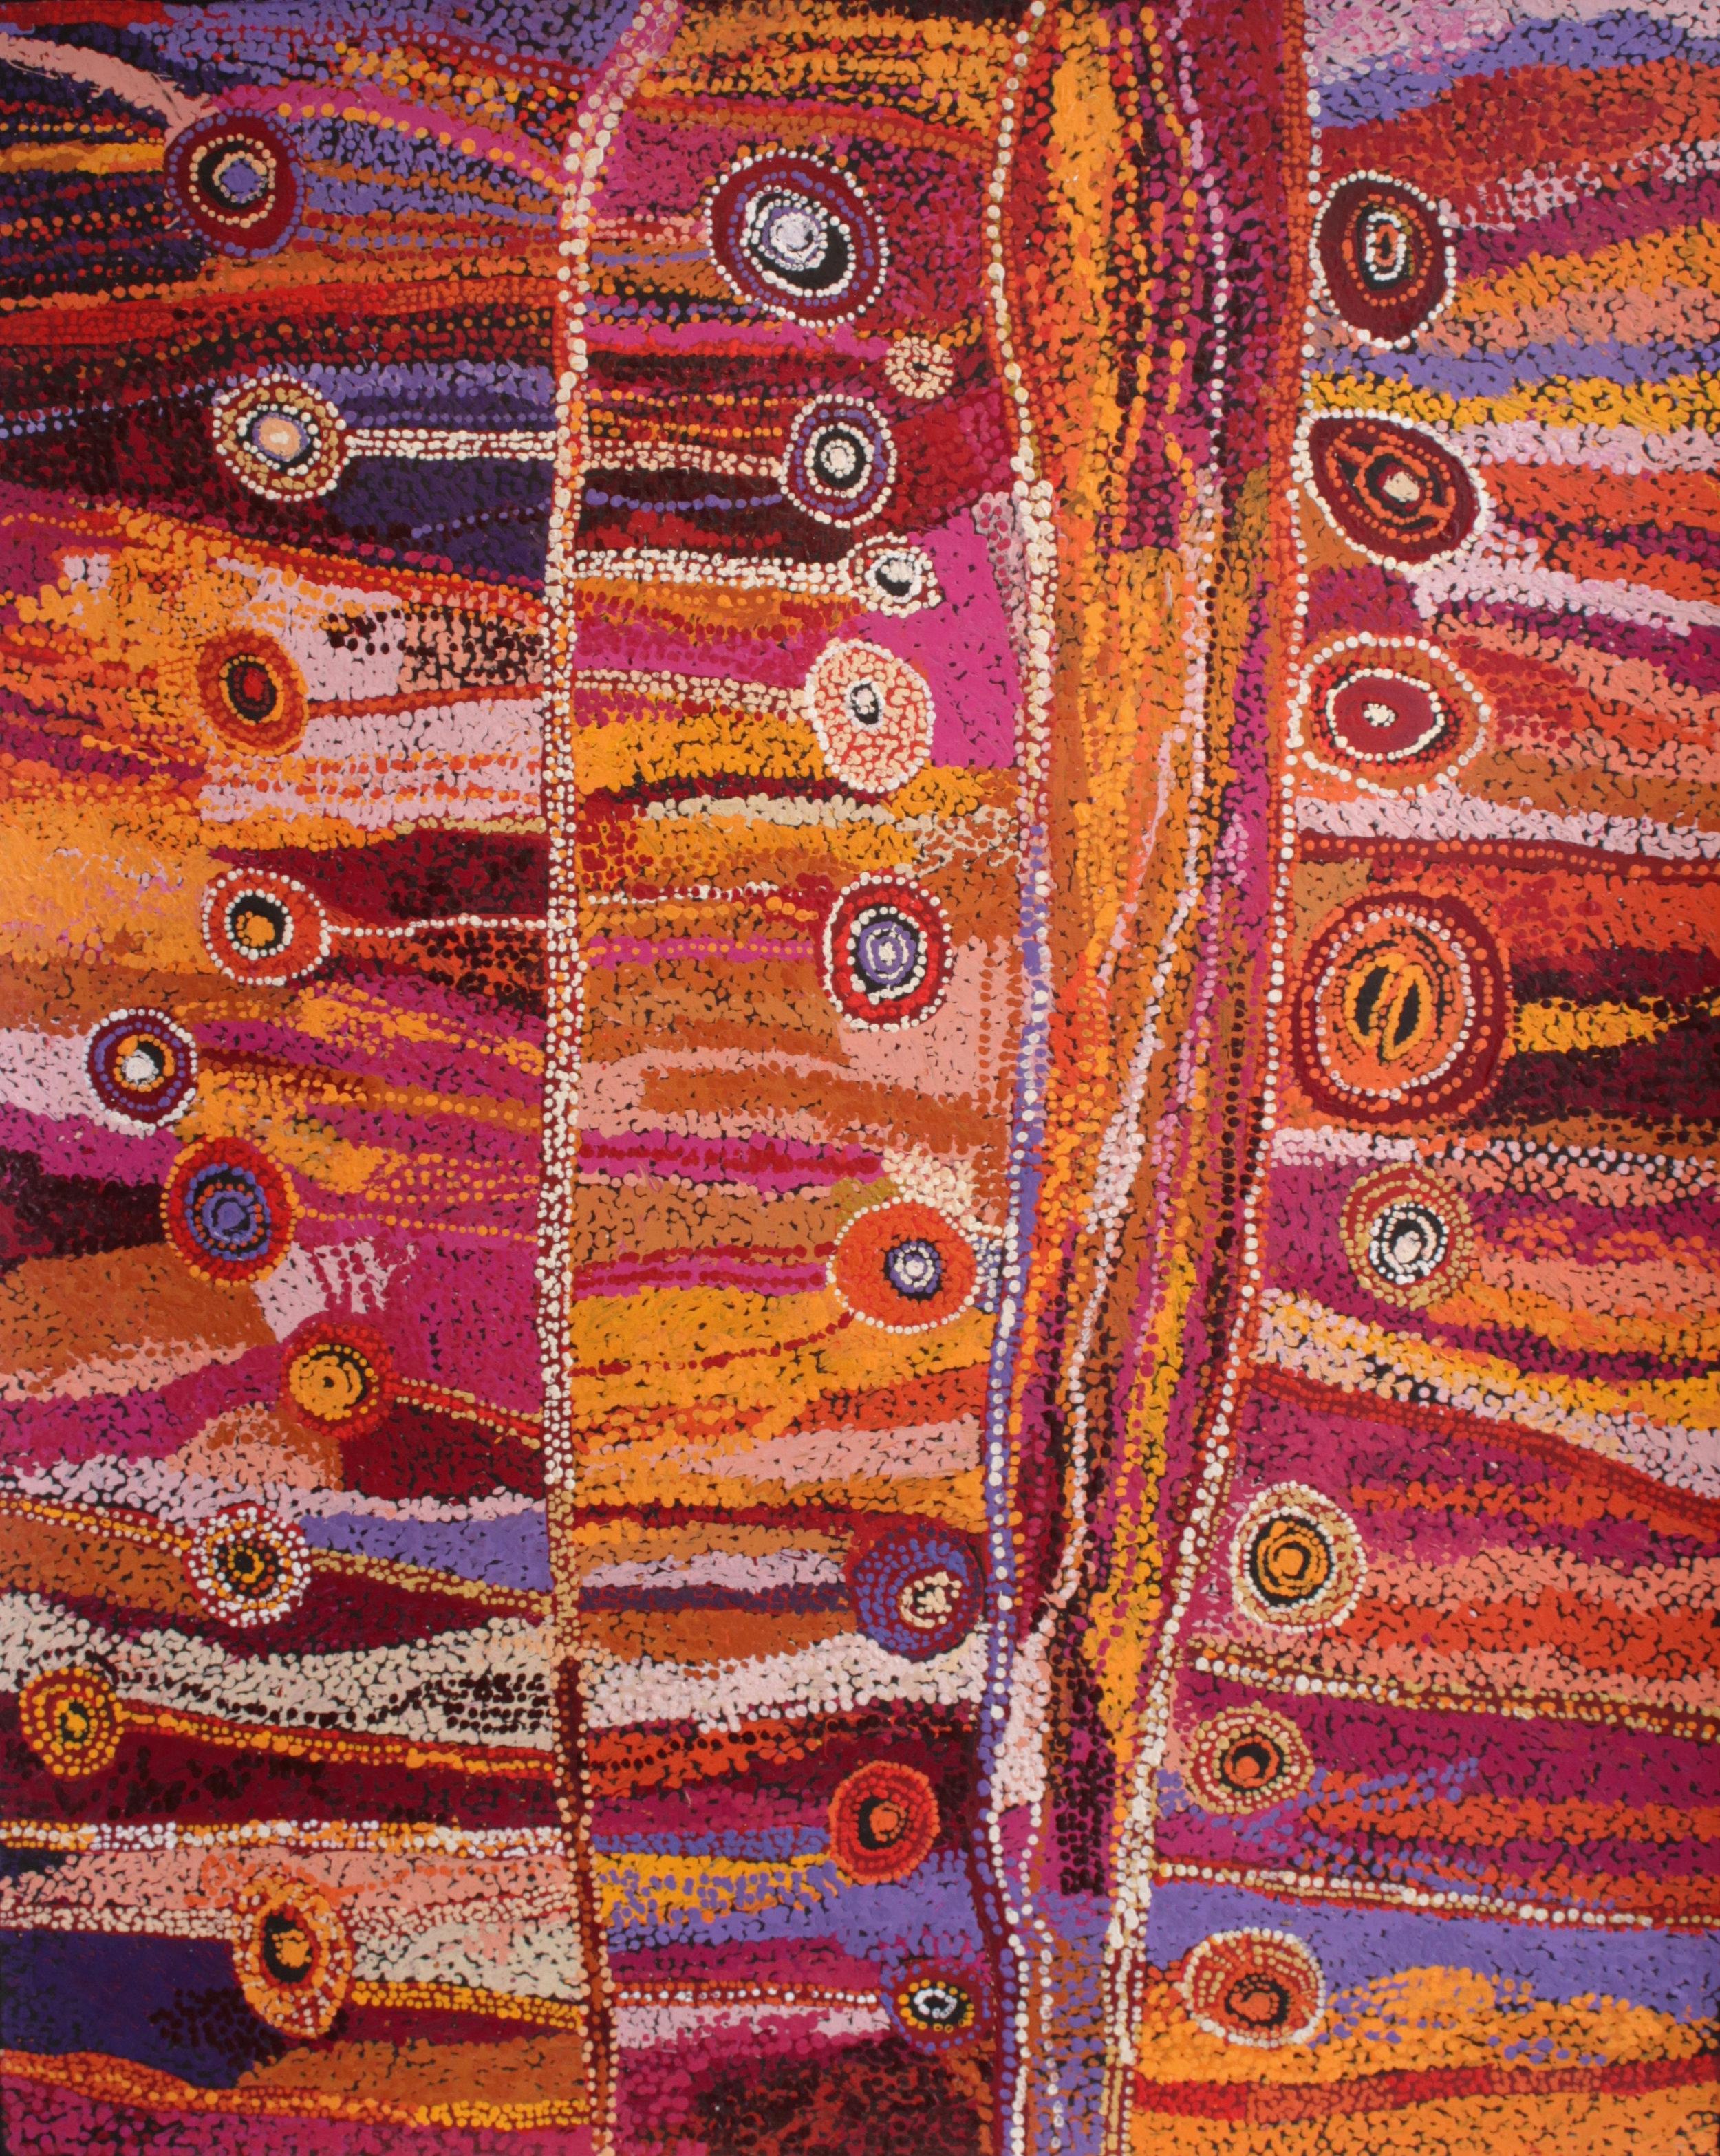 "Wawiriya Burton  Ngayuku ngura- My Country   Acrylic on Belgian linen 1525 x 1220 mm (60 x 48"") Tjala Arts Catalog #454-16   Price Available upon Request"